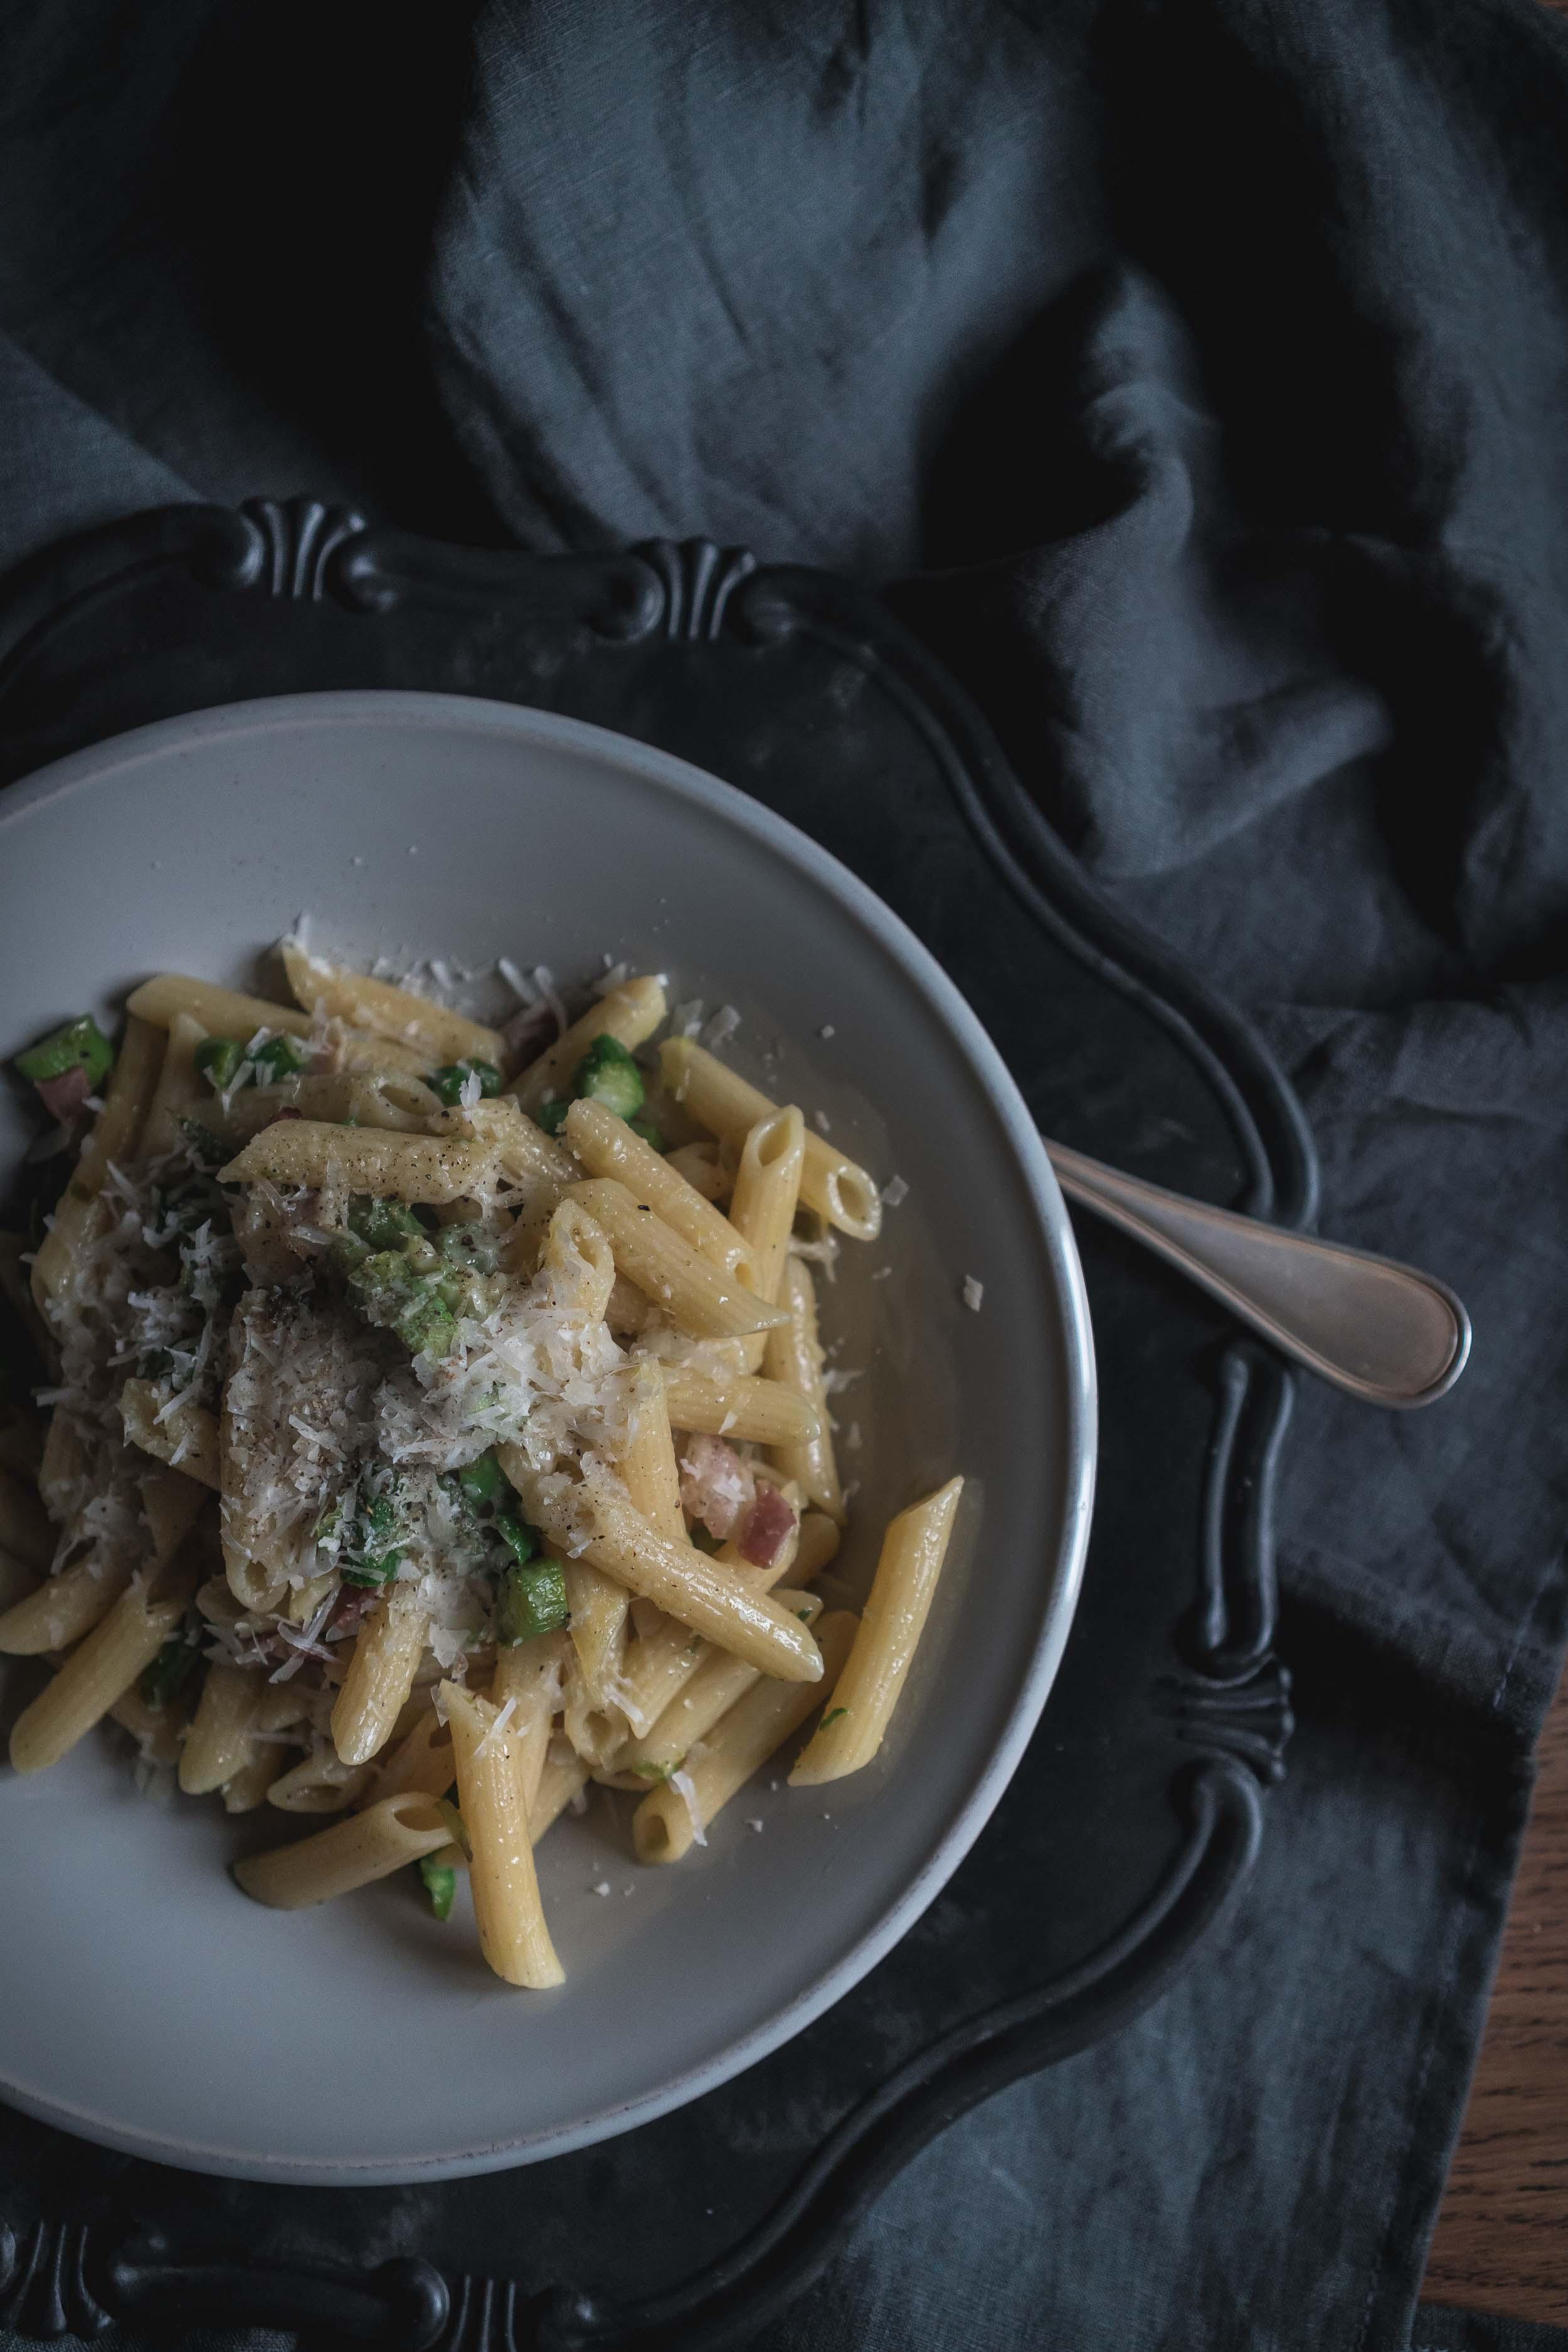 Asparagus-and-Bacon-Penne-Pasta-05134.jpg